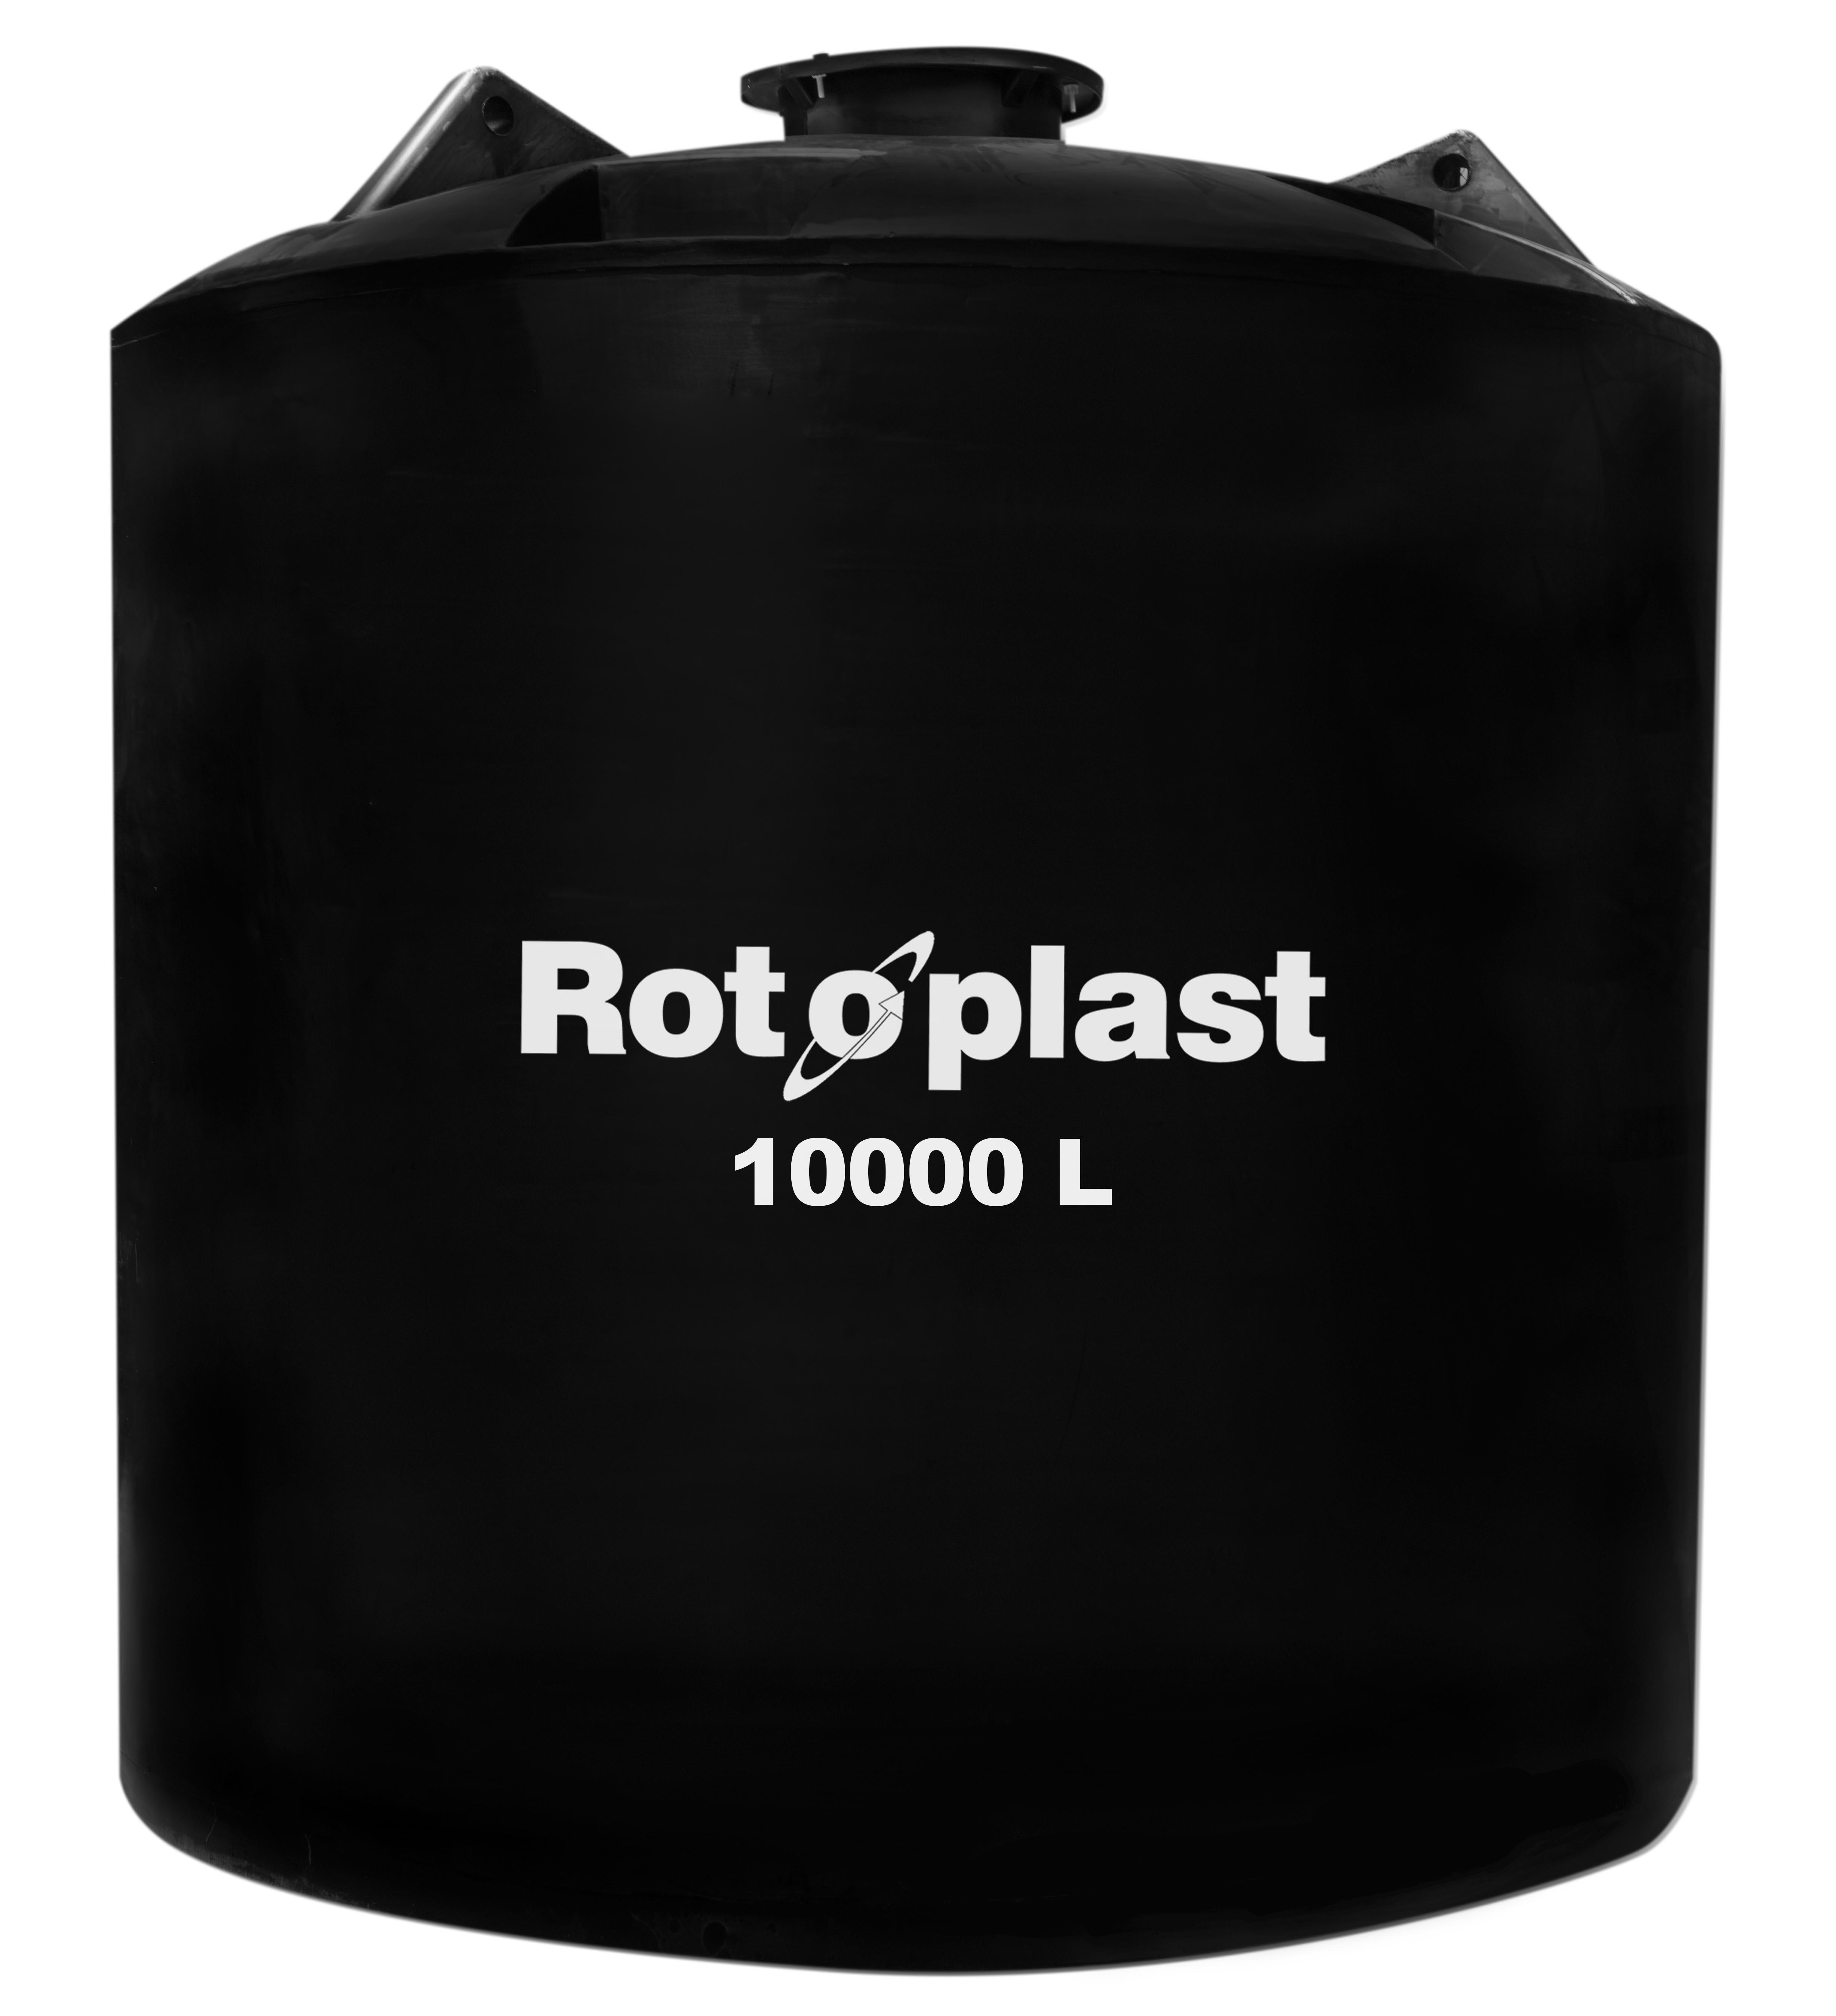 Biodigestor 10000